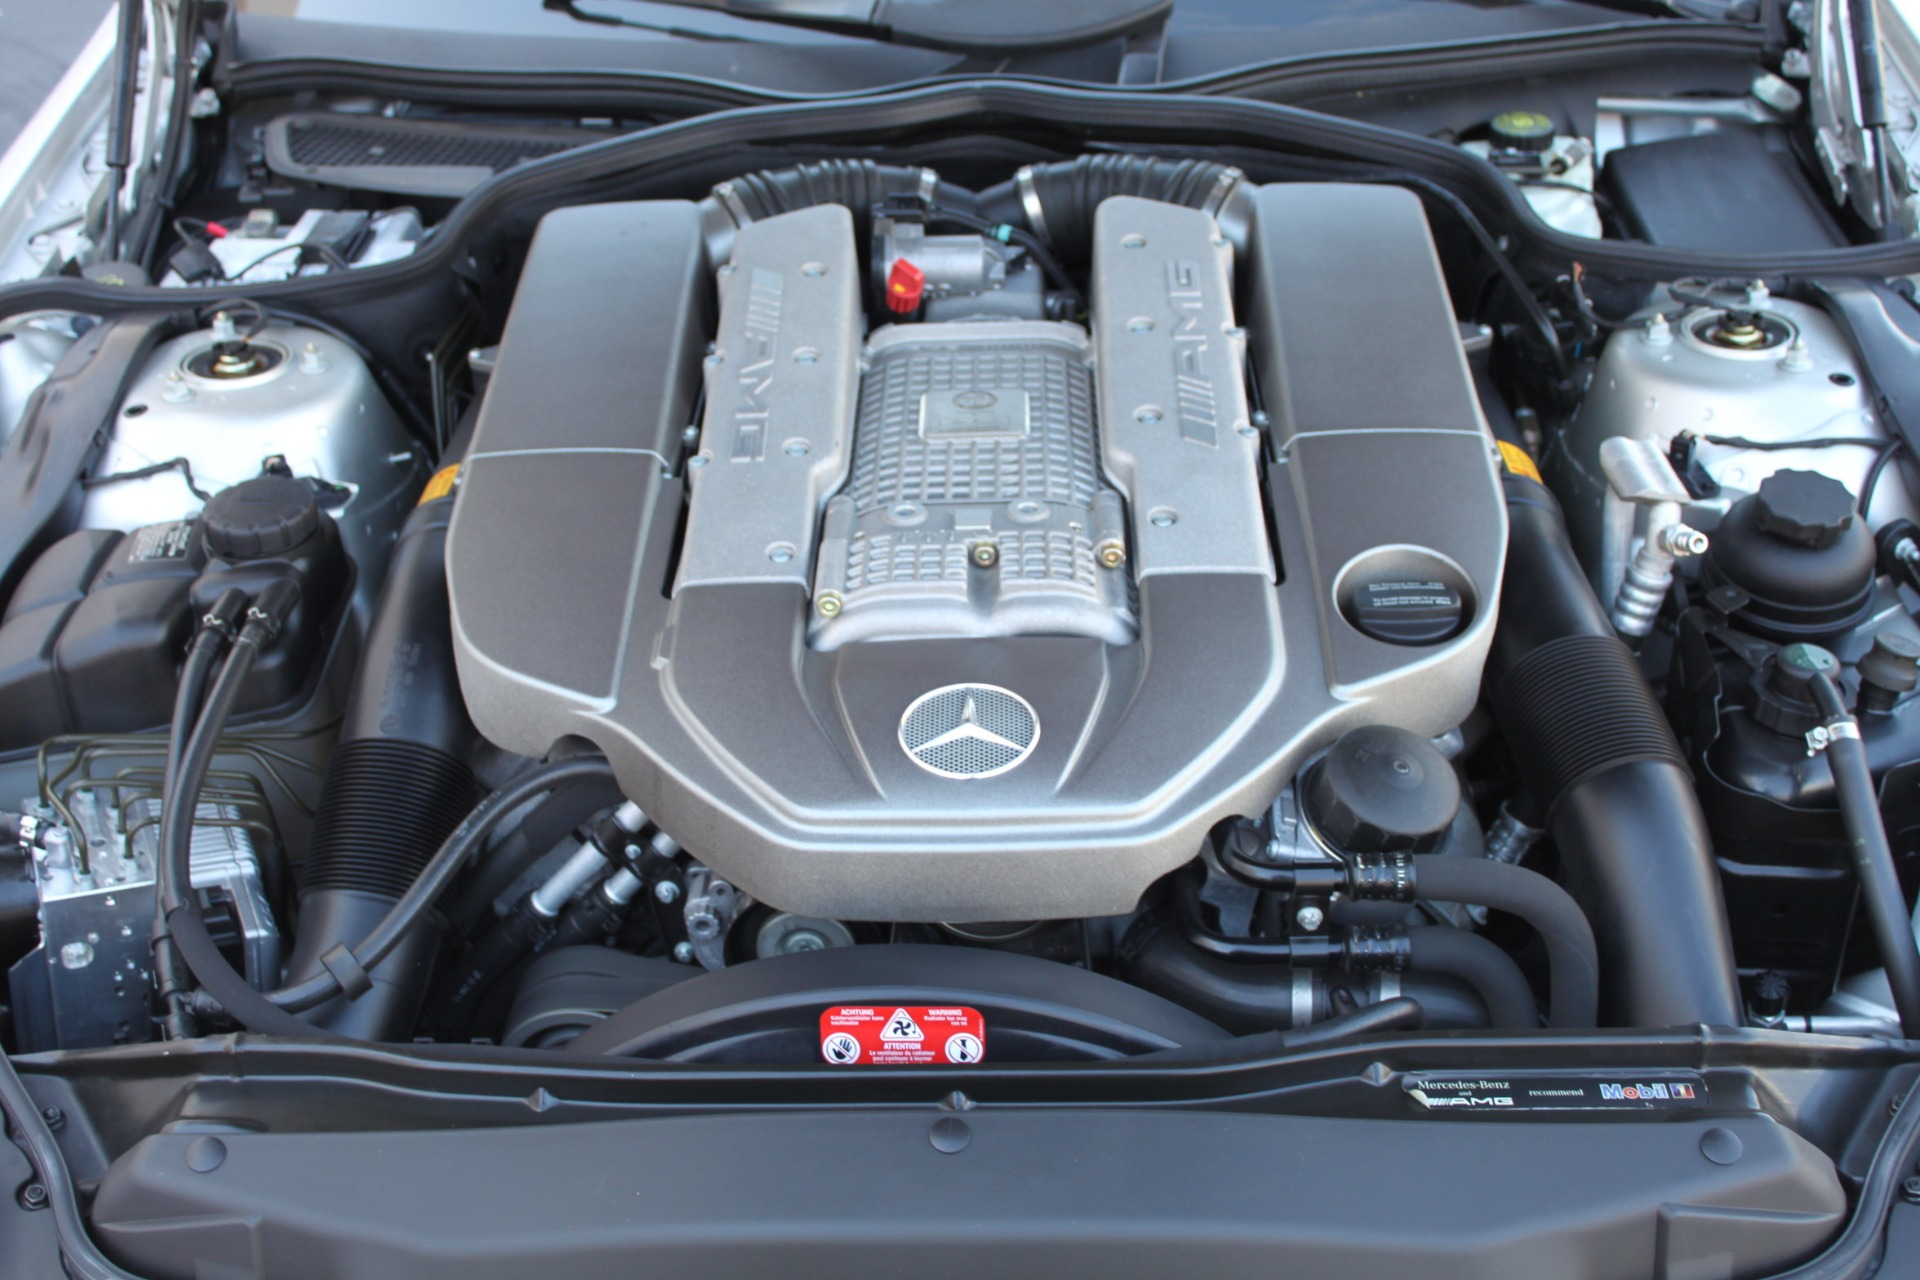 Used-2003-Mercedes-Benz-SL-Class-AMG-Land-Cruiser